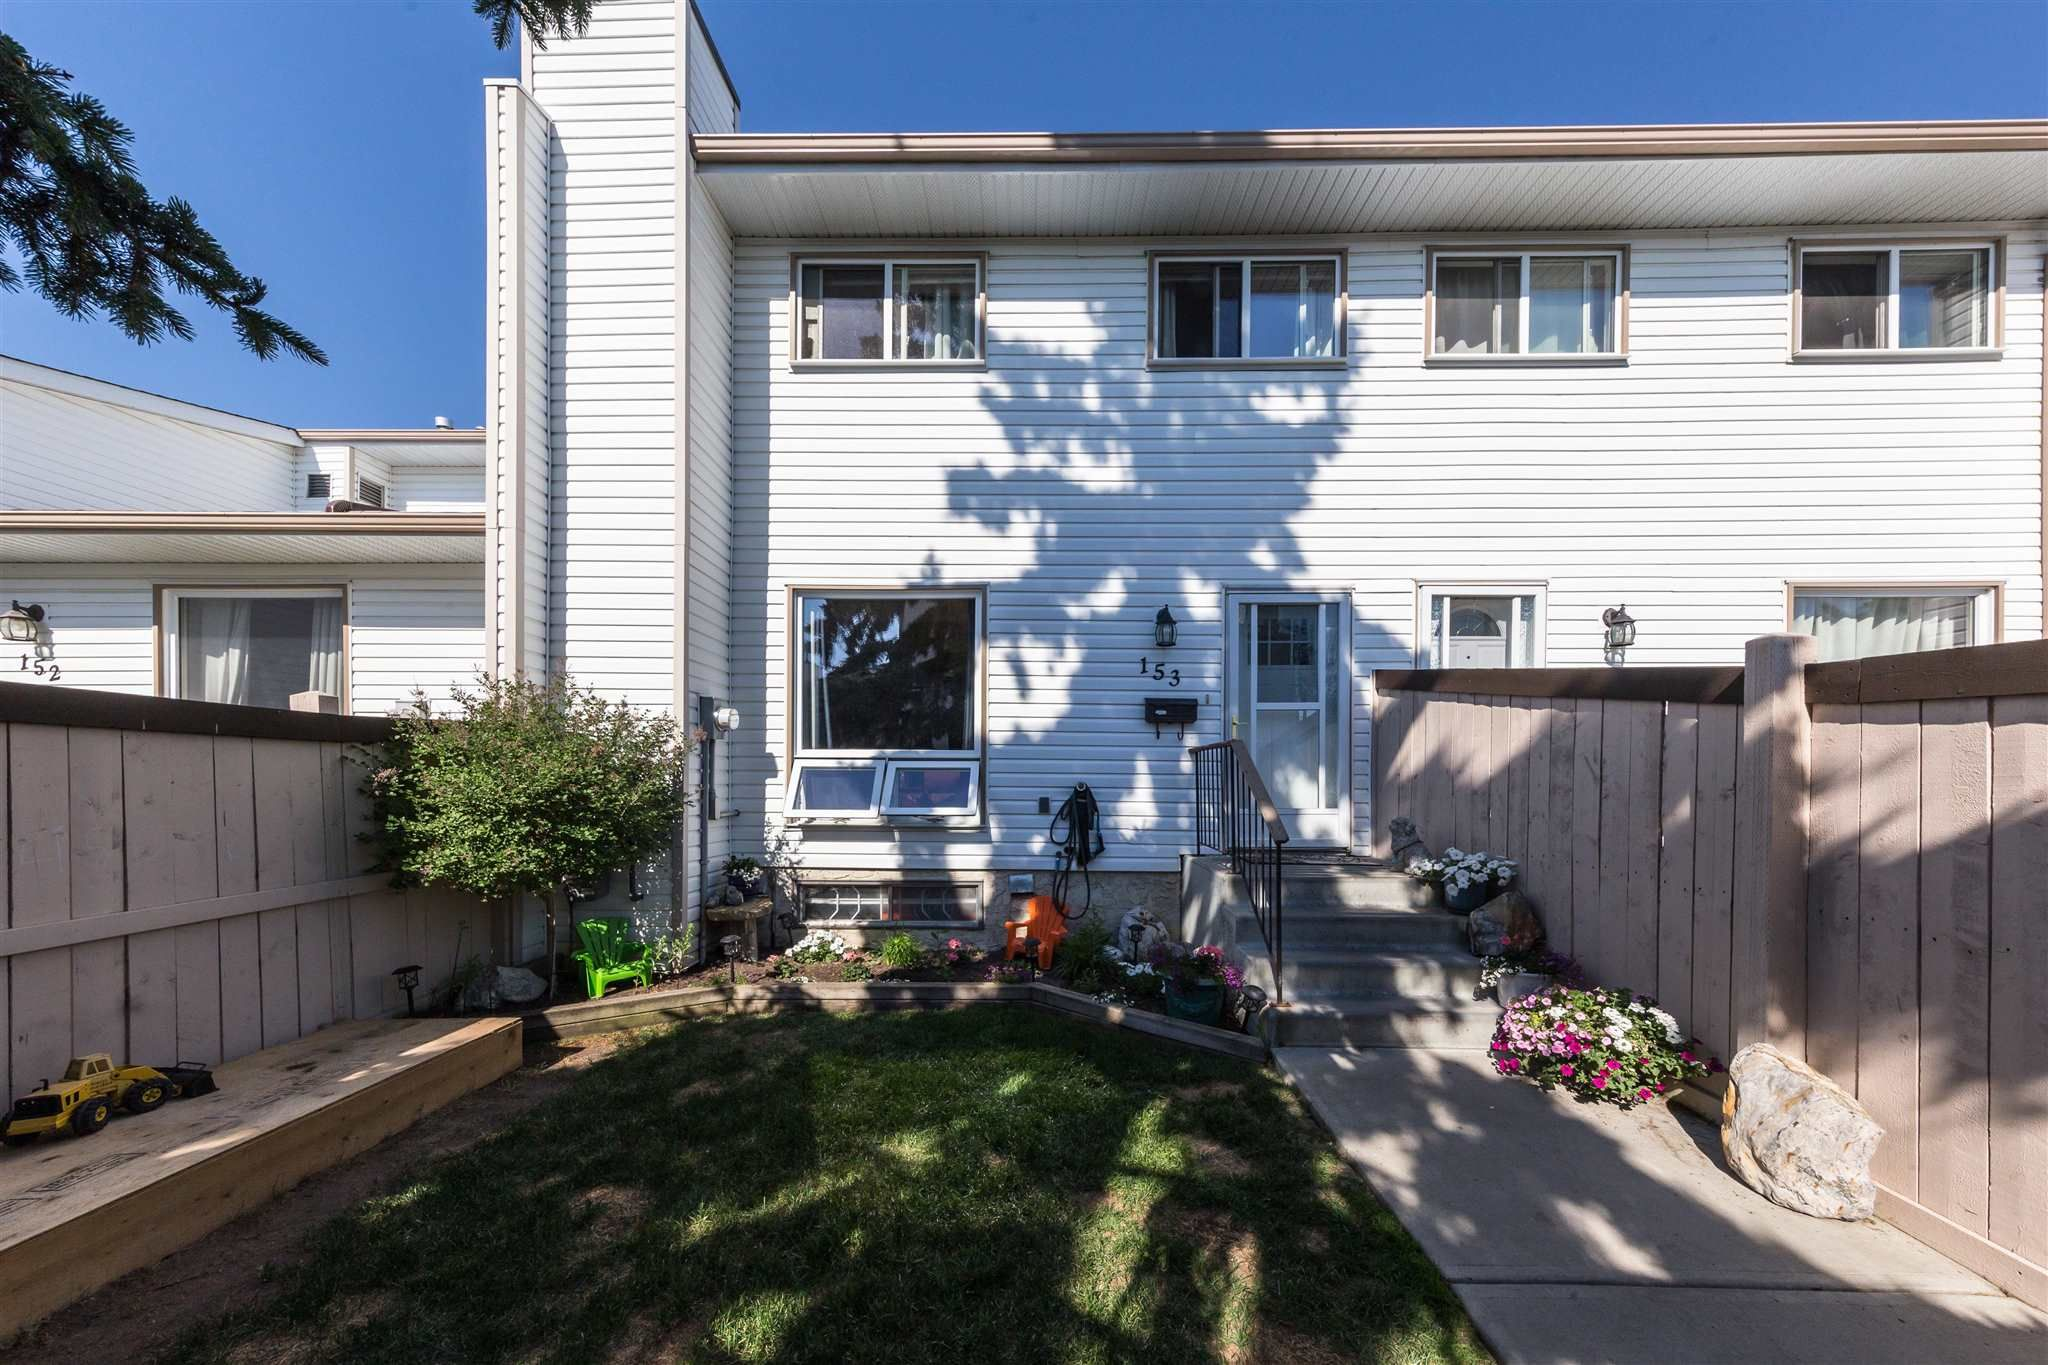 Main Photo: 153 MARLBOROUGH Place in Edmonton: Zone 20 Townhouse for sale : MLS®# E4252834